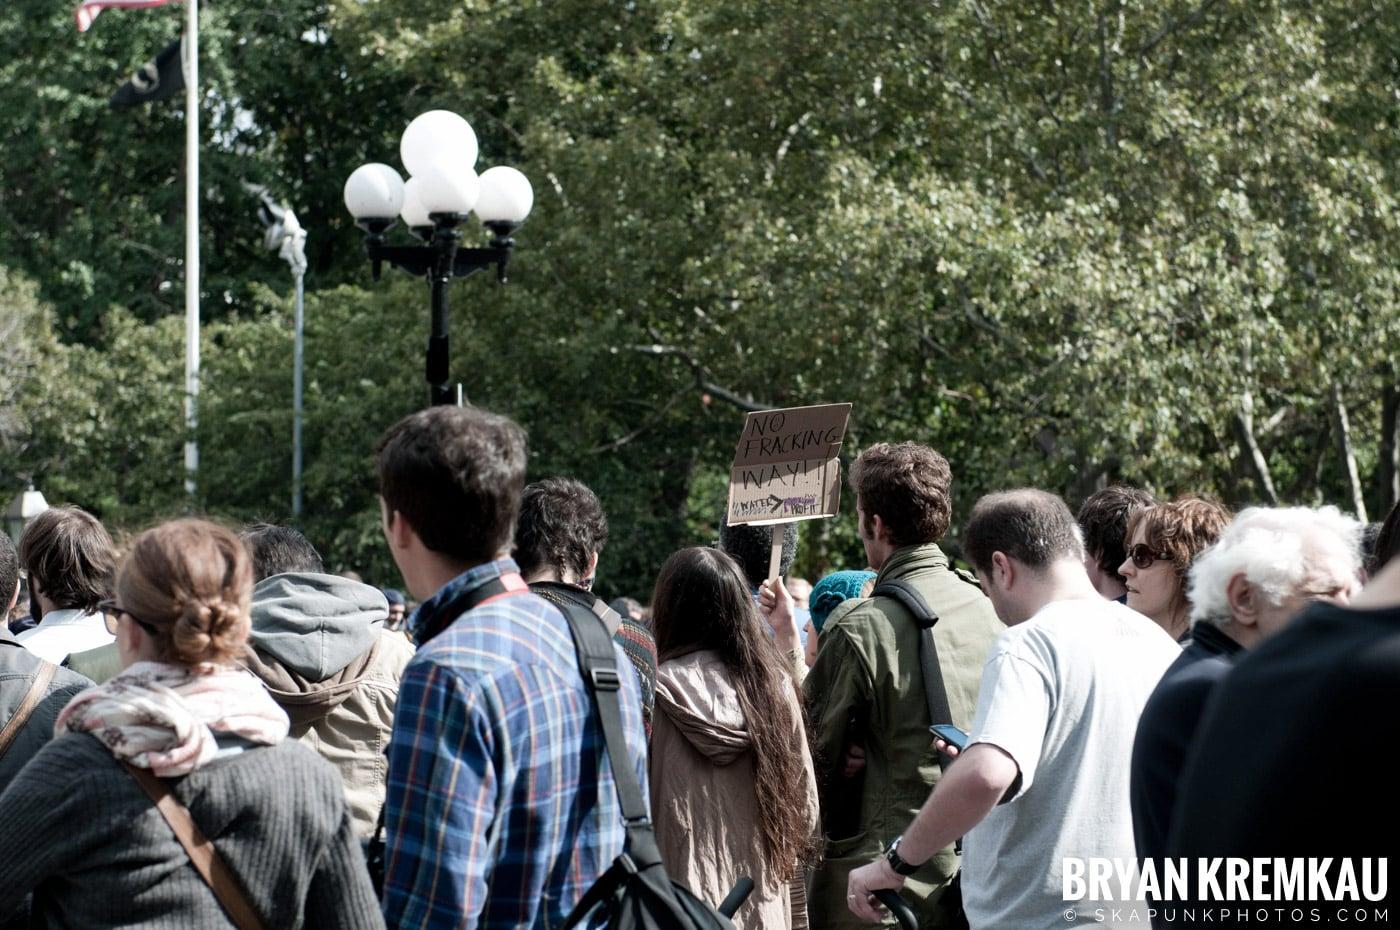 Occupy Wall Street @ Zuccotti Park and Washington Square Park, NYC - 10.15.11 (91)